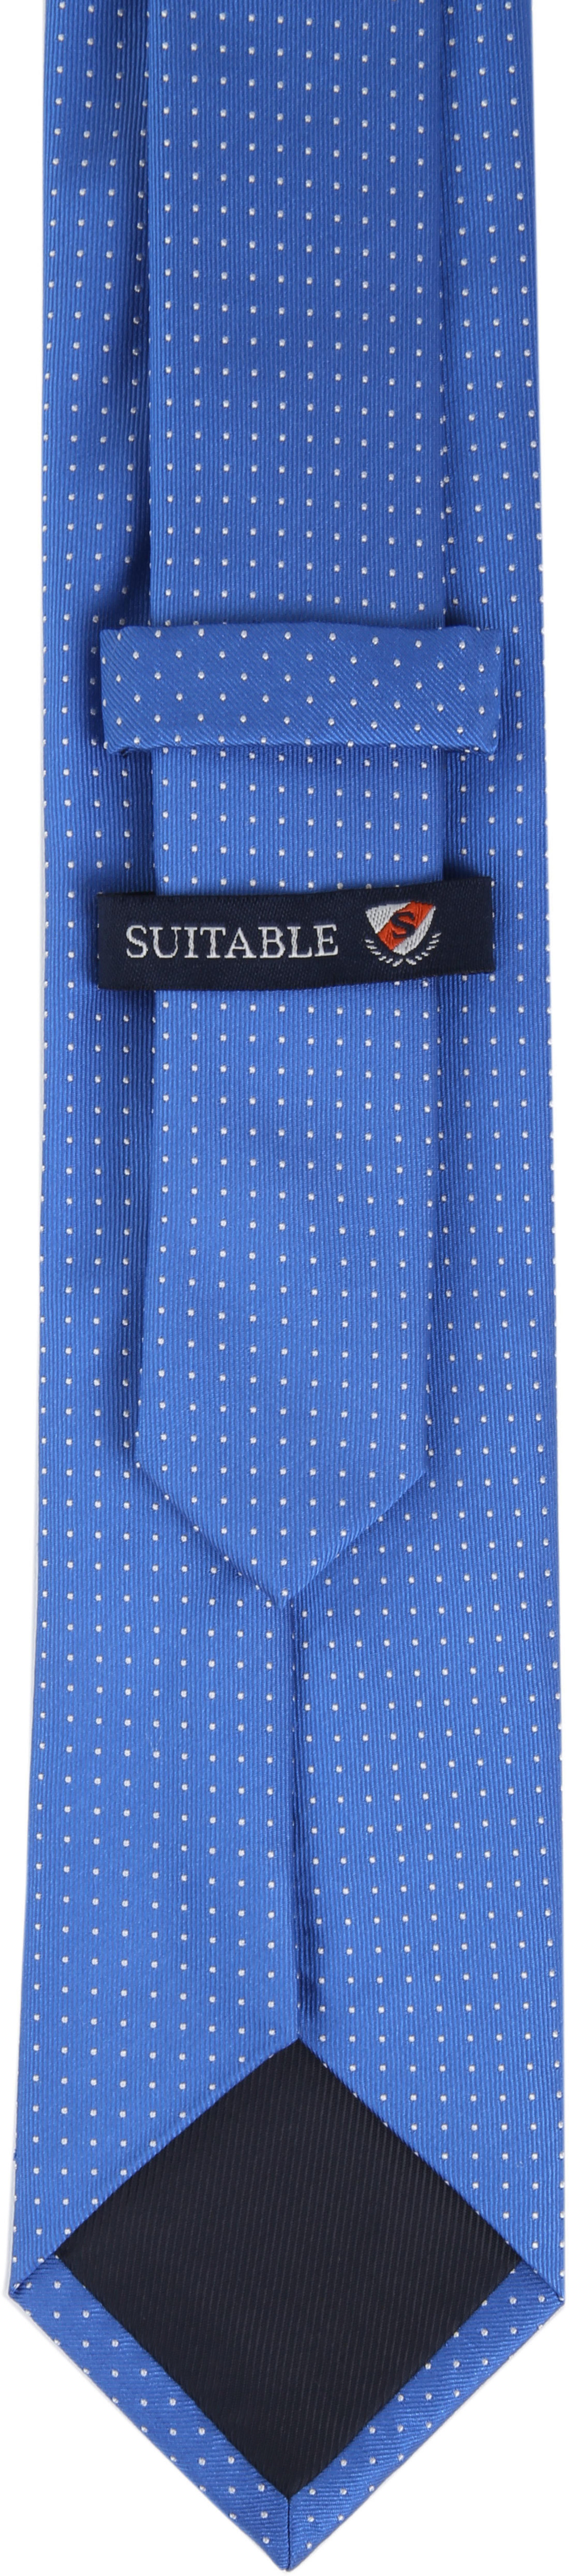 Silk Tie Dots Blue foto 3